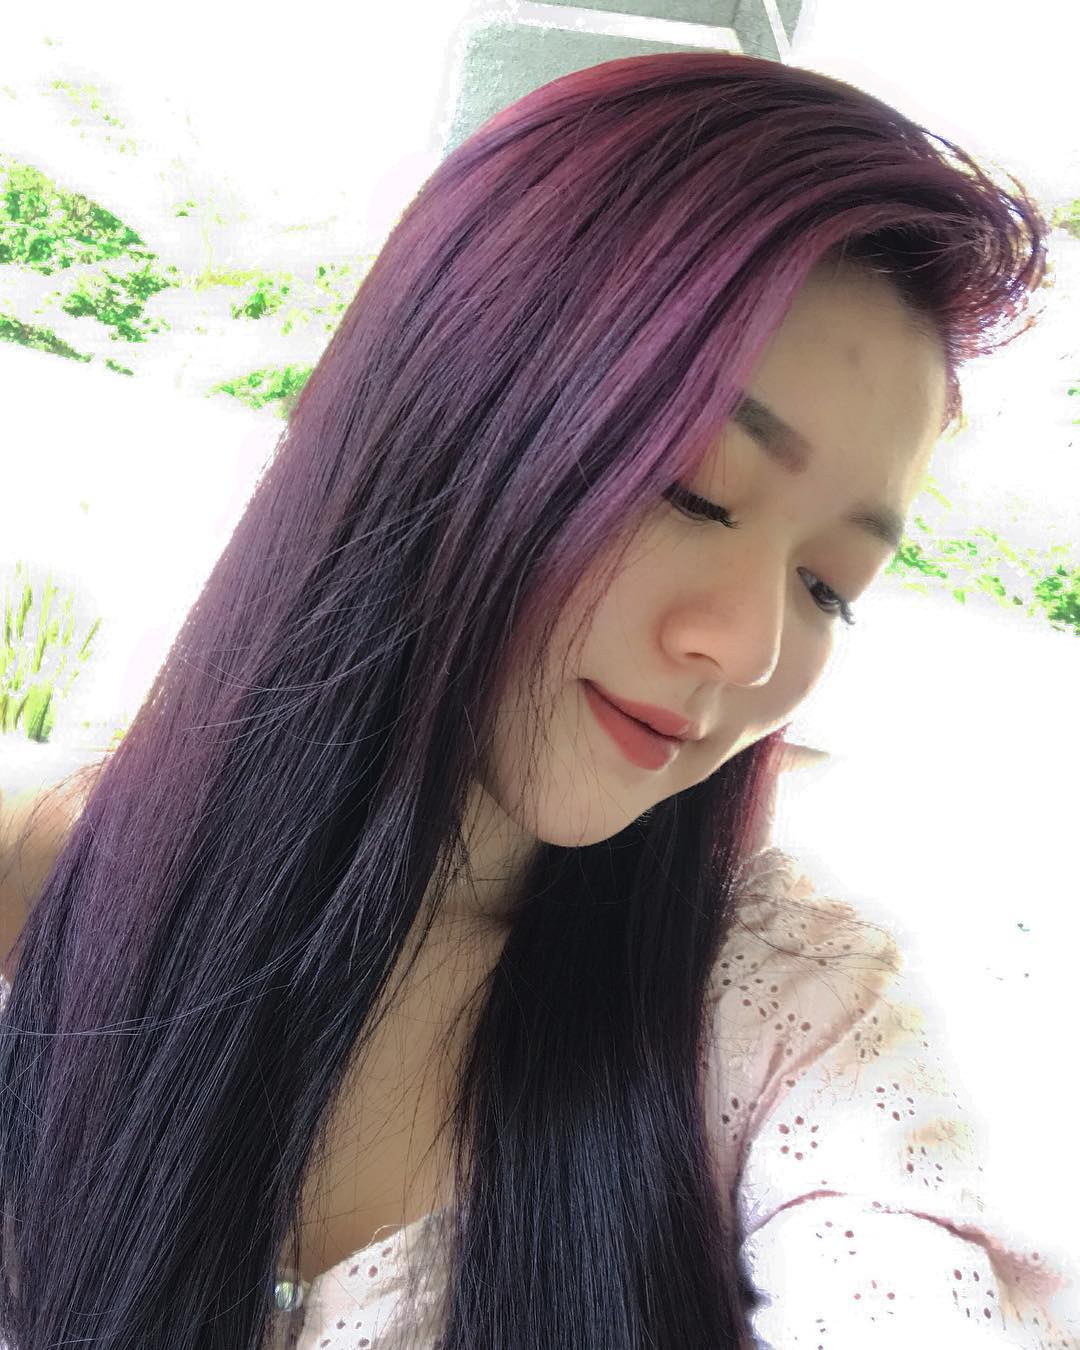 lunghi lisci viola